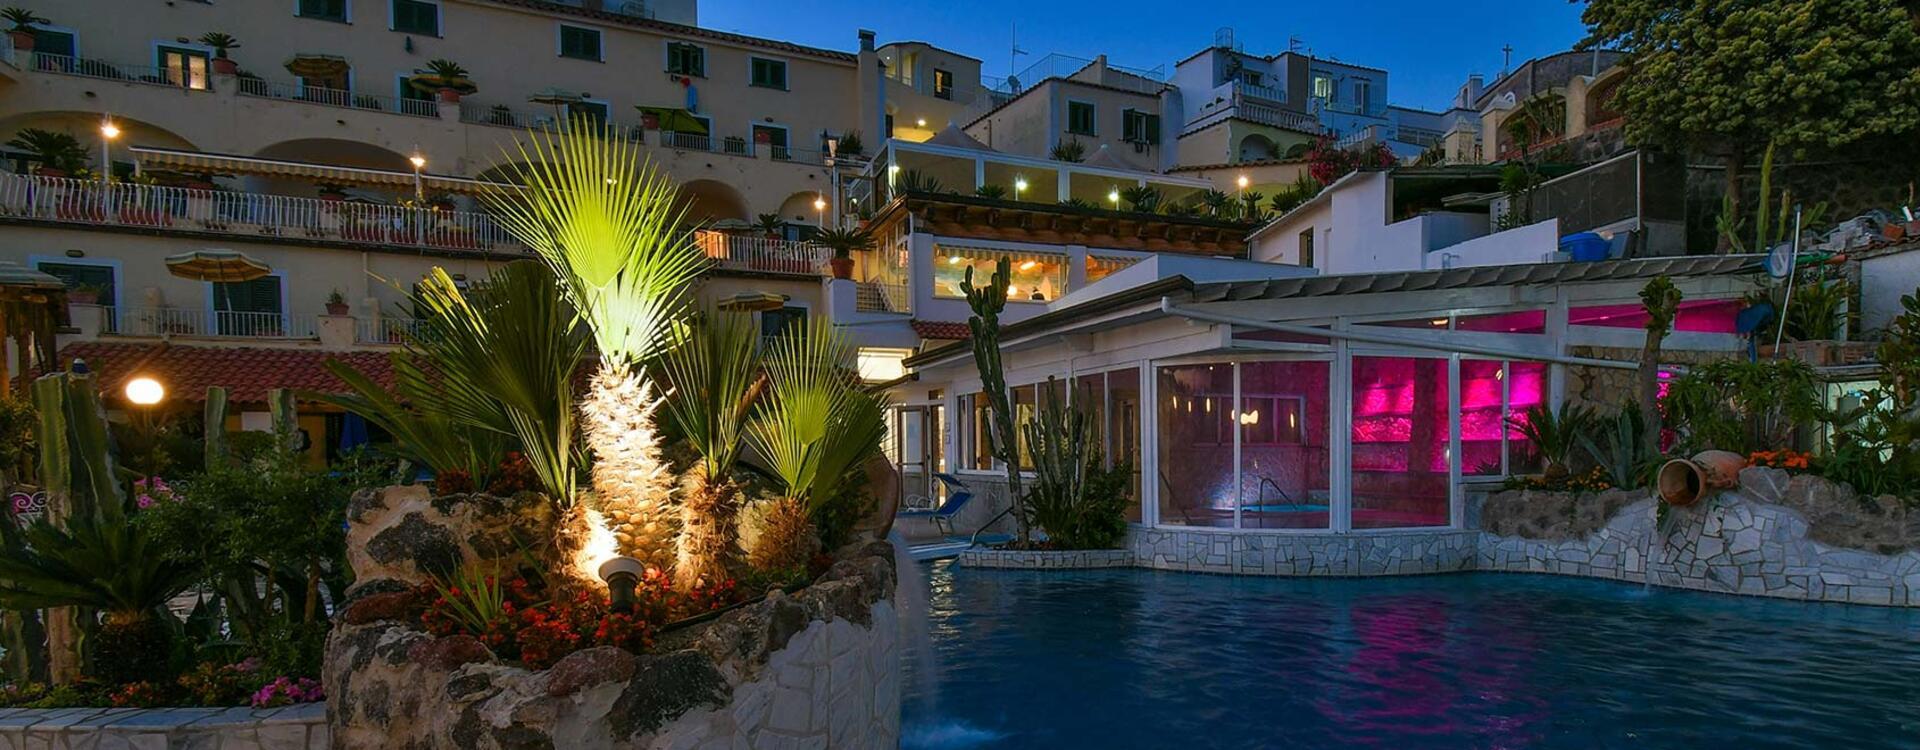 hotelsaintraphaelischia it hotel 009